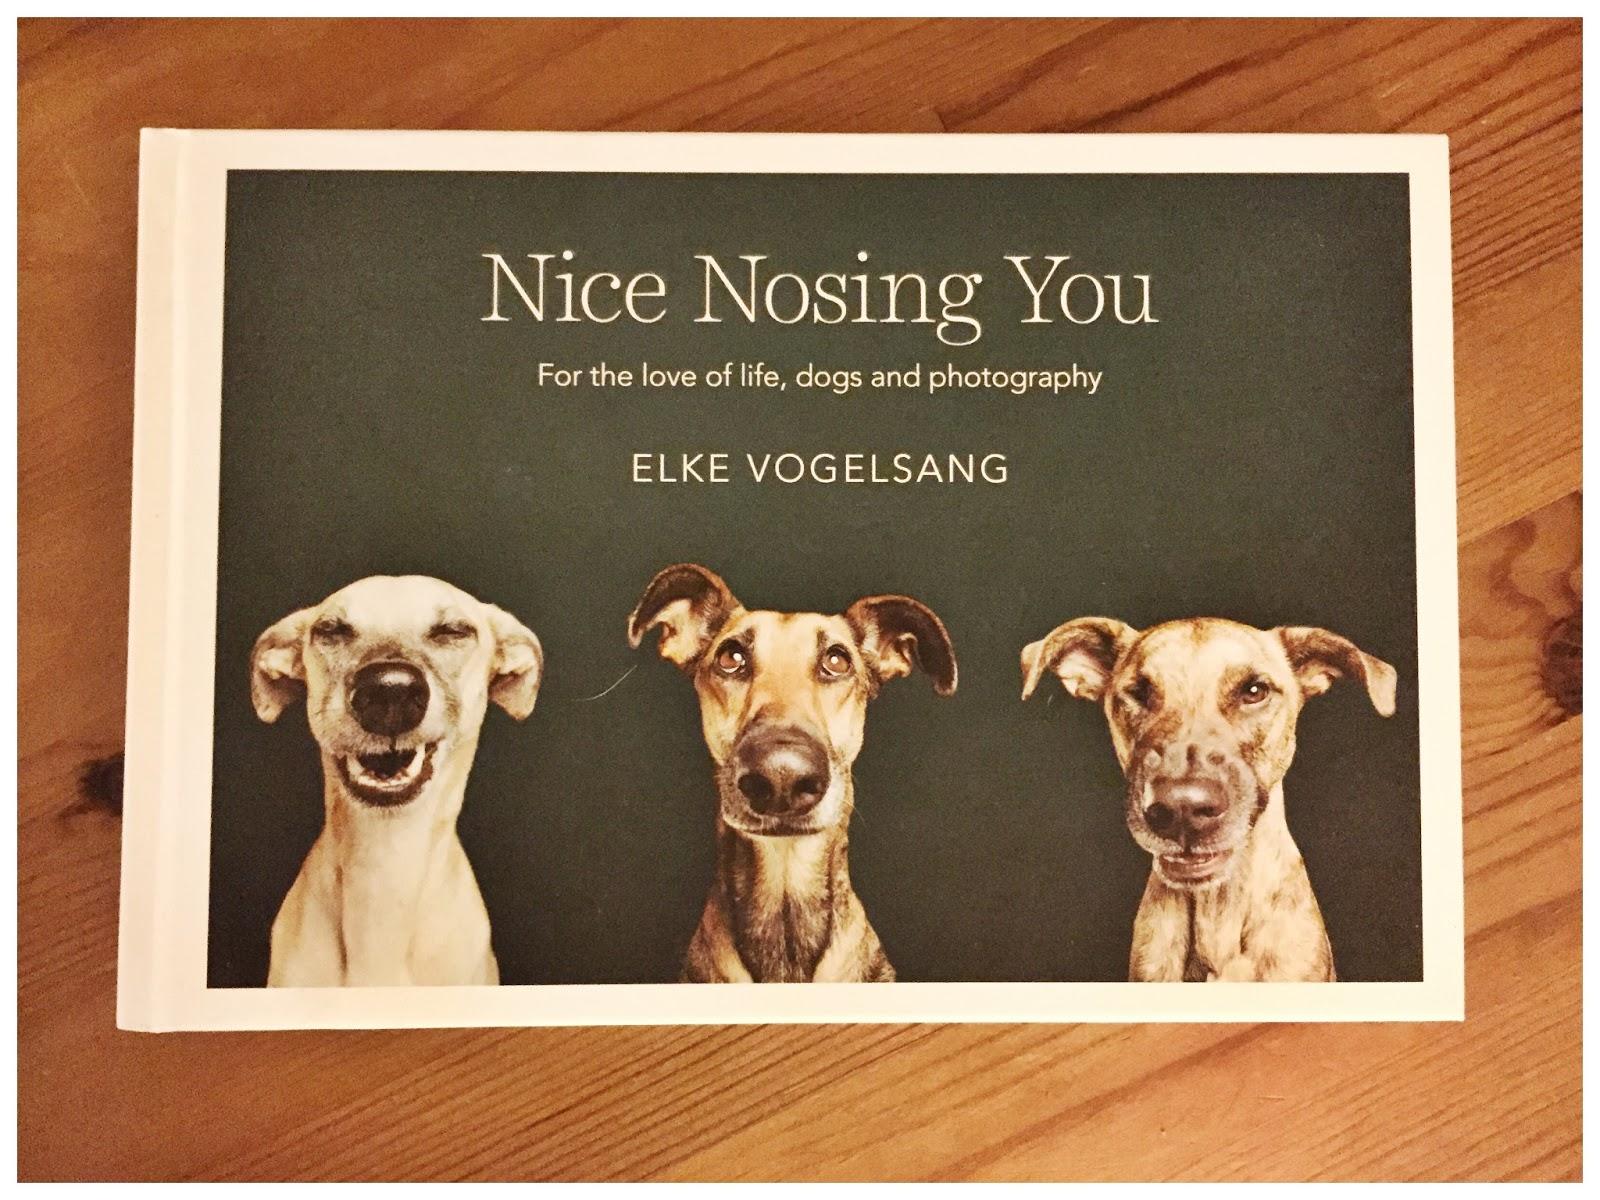 Nice nosing you rezension